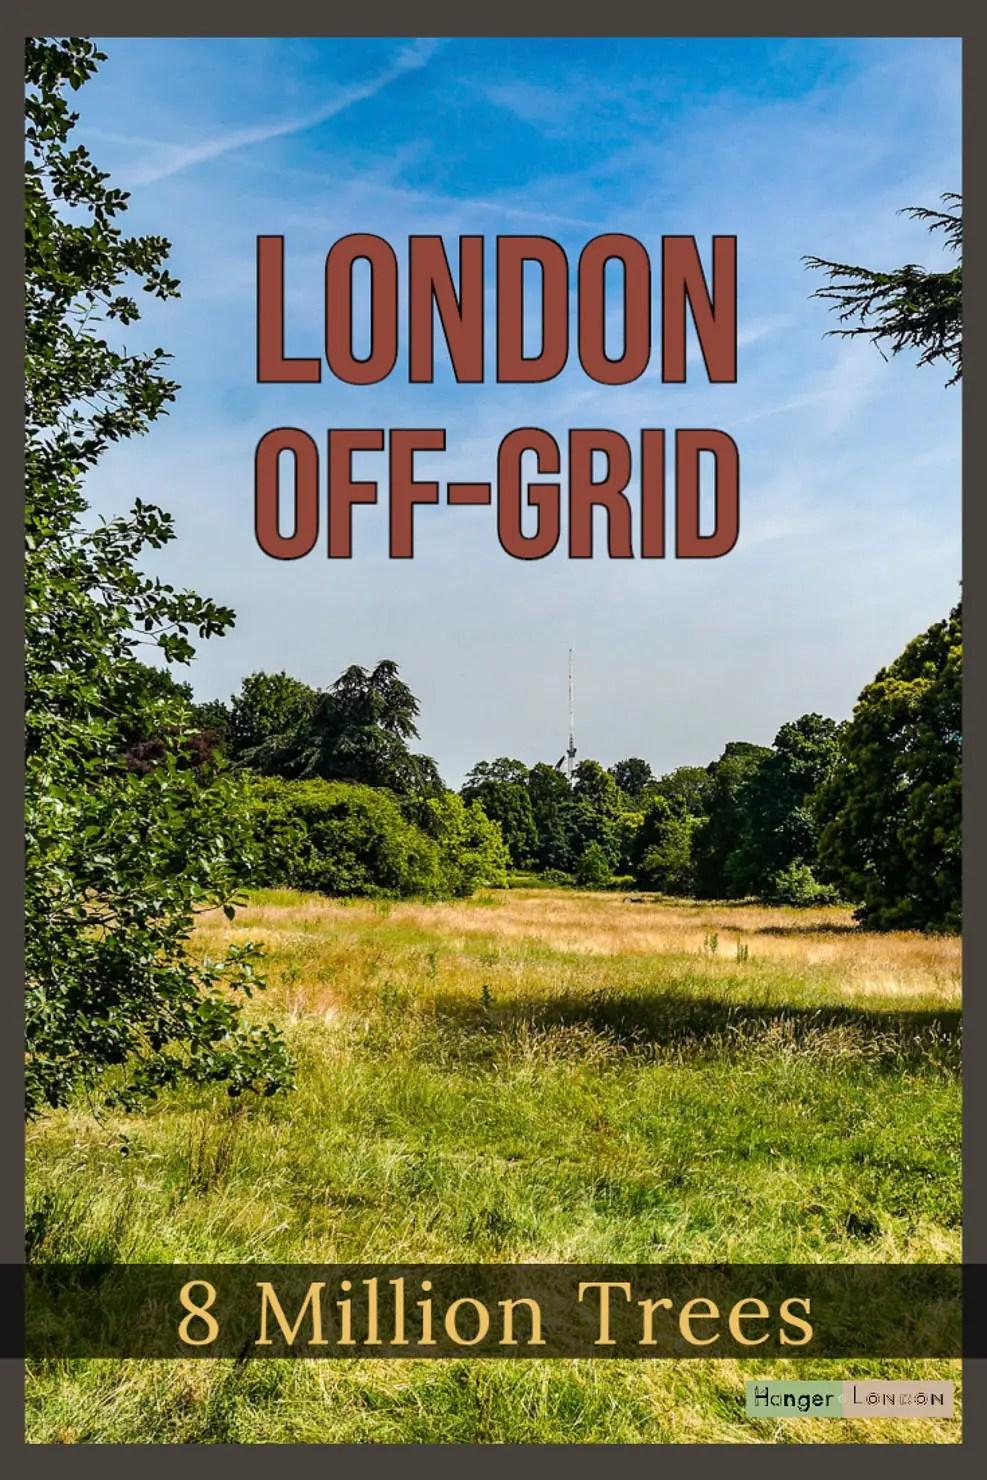 London off-grid